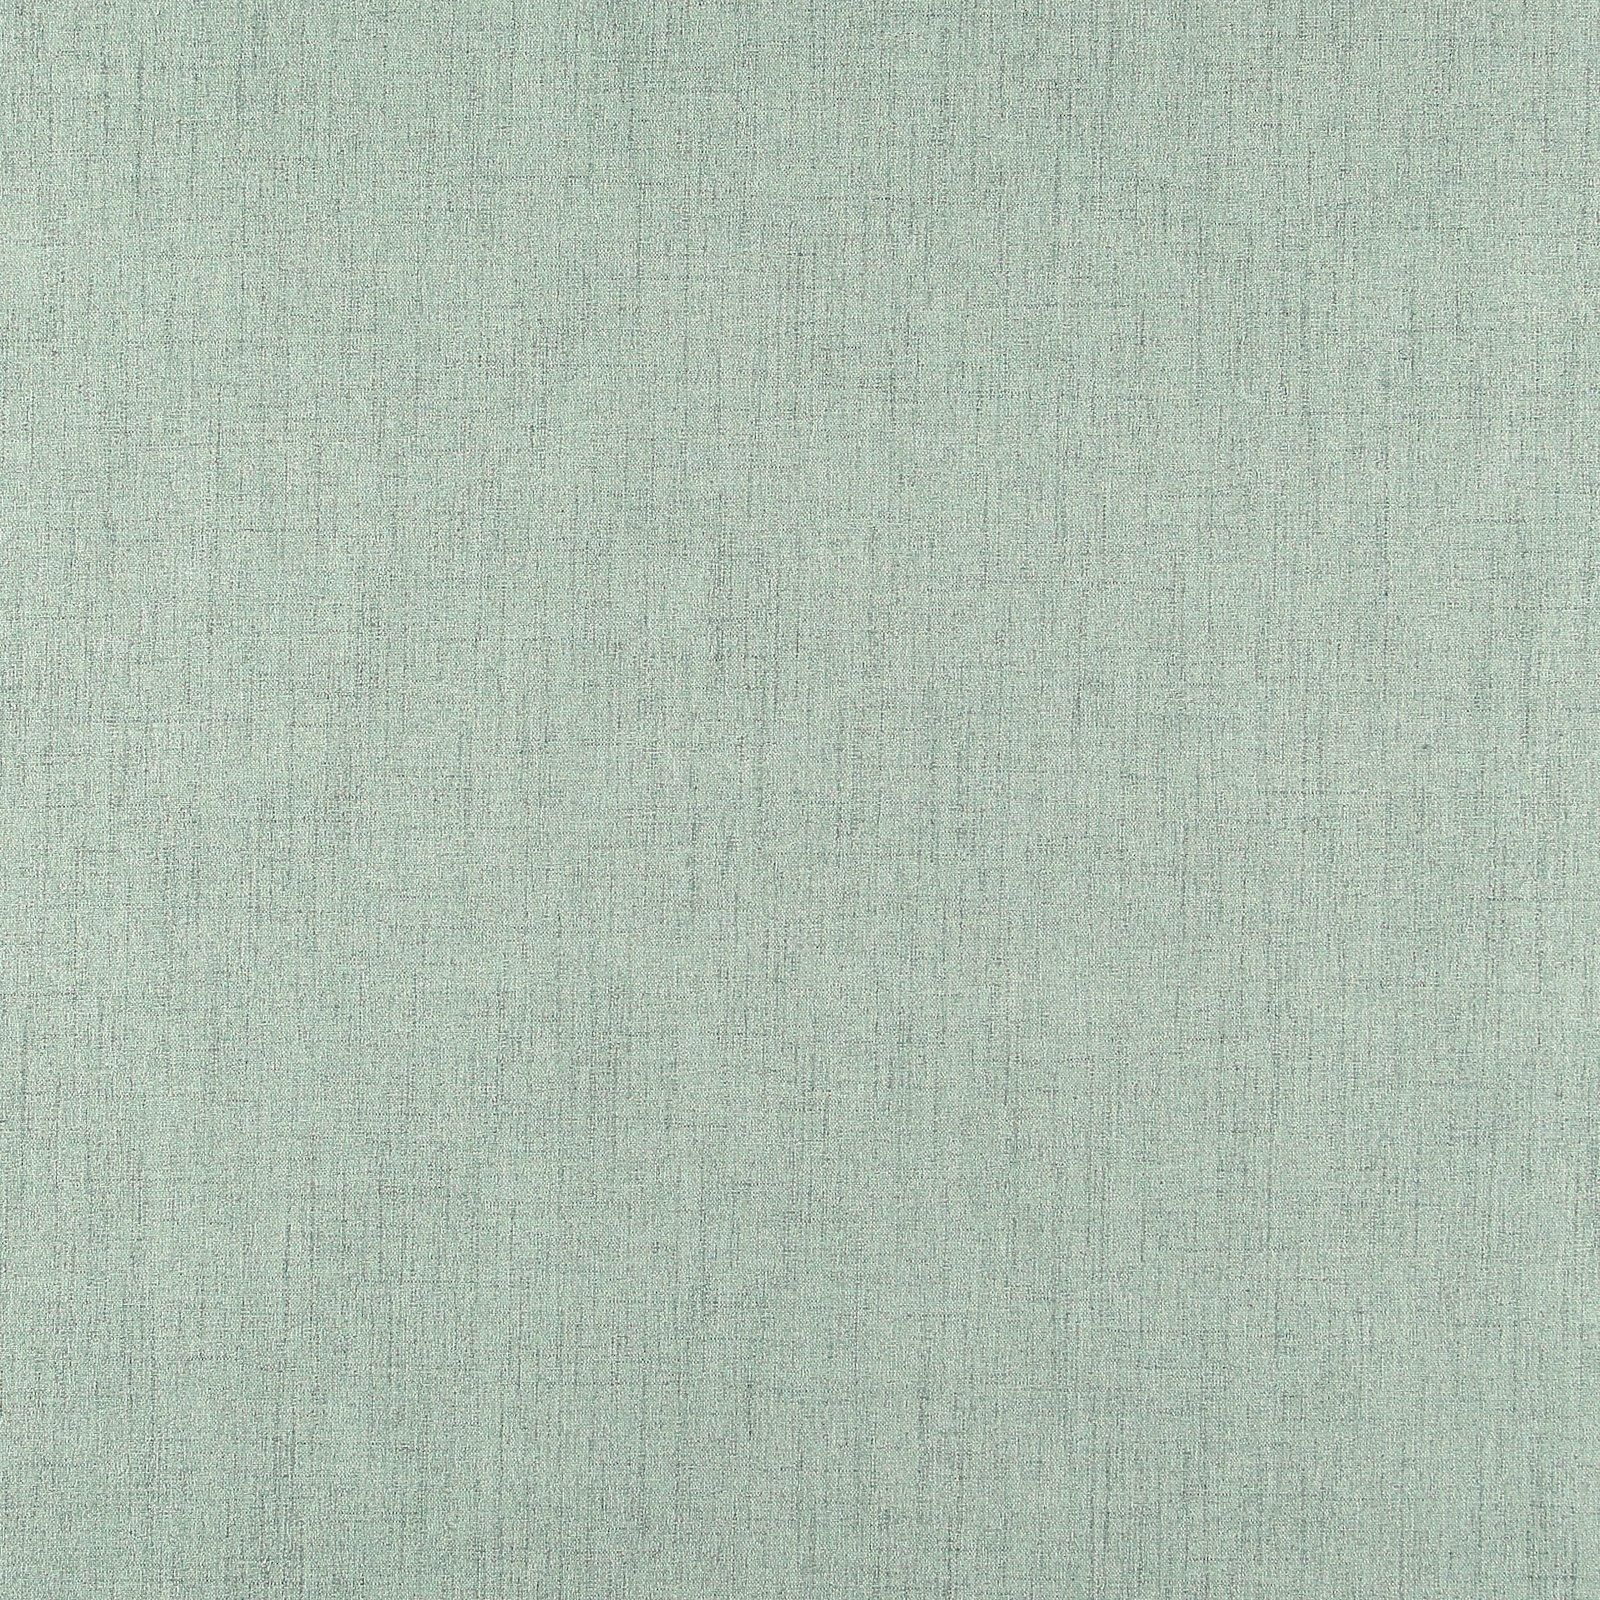 Upholstery fabric w/backing dusty aqua 824050_pack_sp